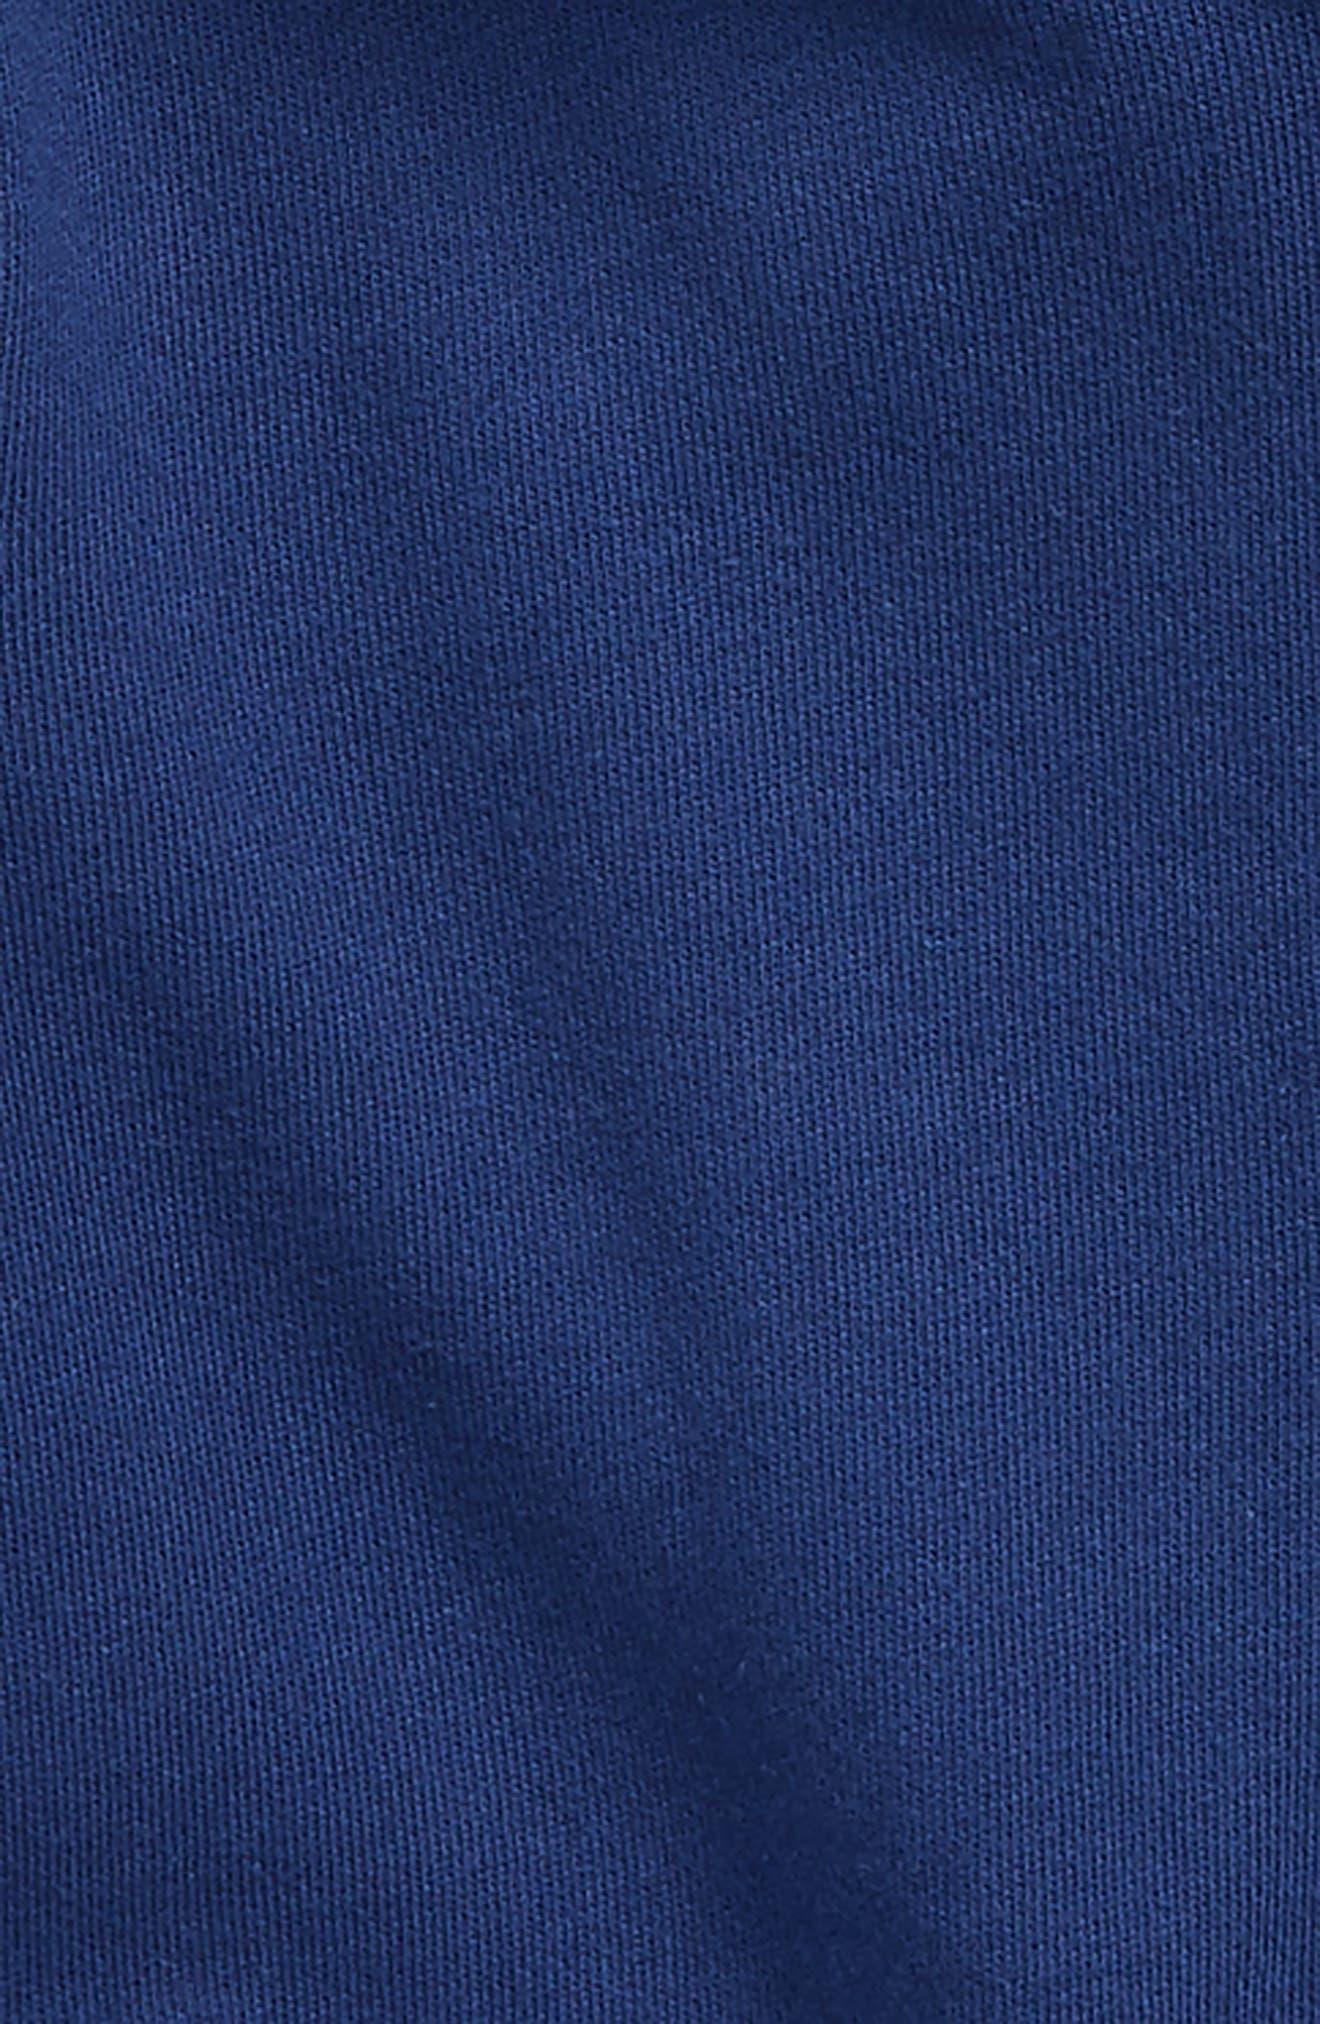 Starry Zip Hoodie,                             Alternate thumbnail 2, color,                             Beacon Blue